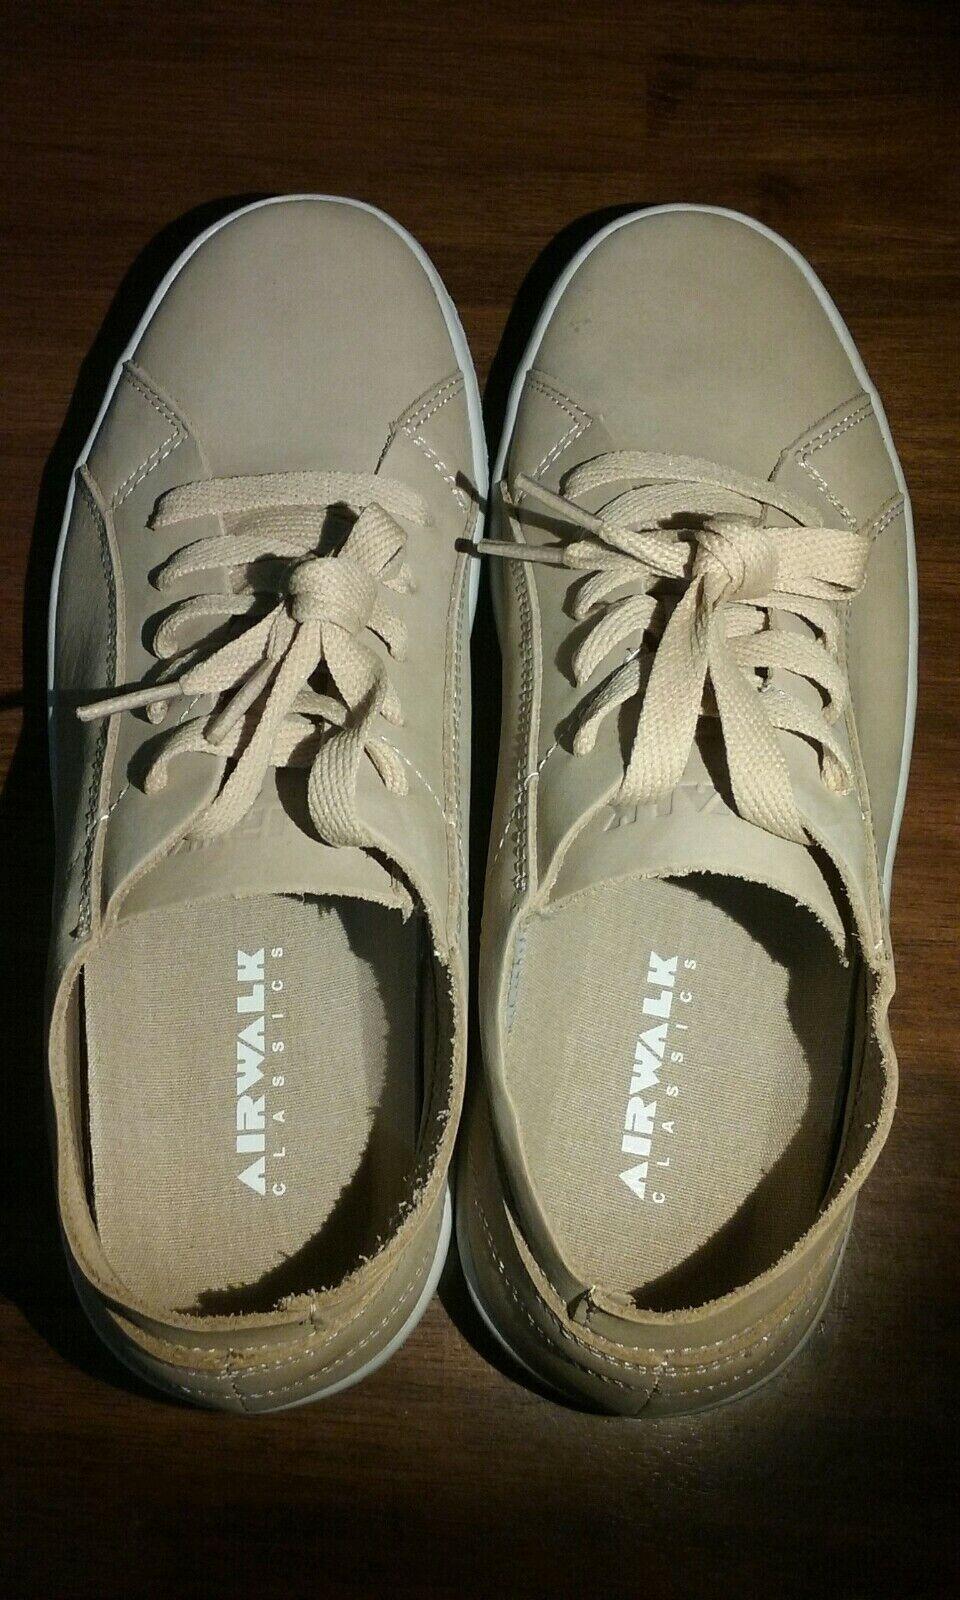 NIB Uomo Dimensione Dimensione Dimensione 9 AIRWALK Second Skin Natural Skate scarpe Leather bd7059